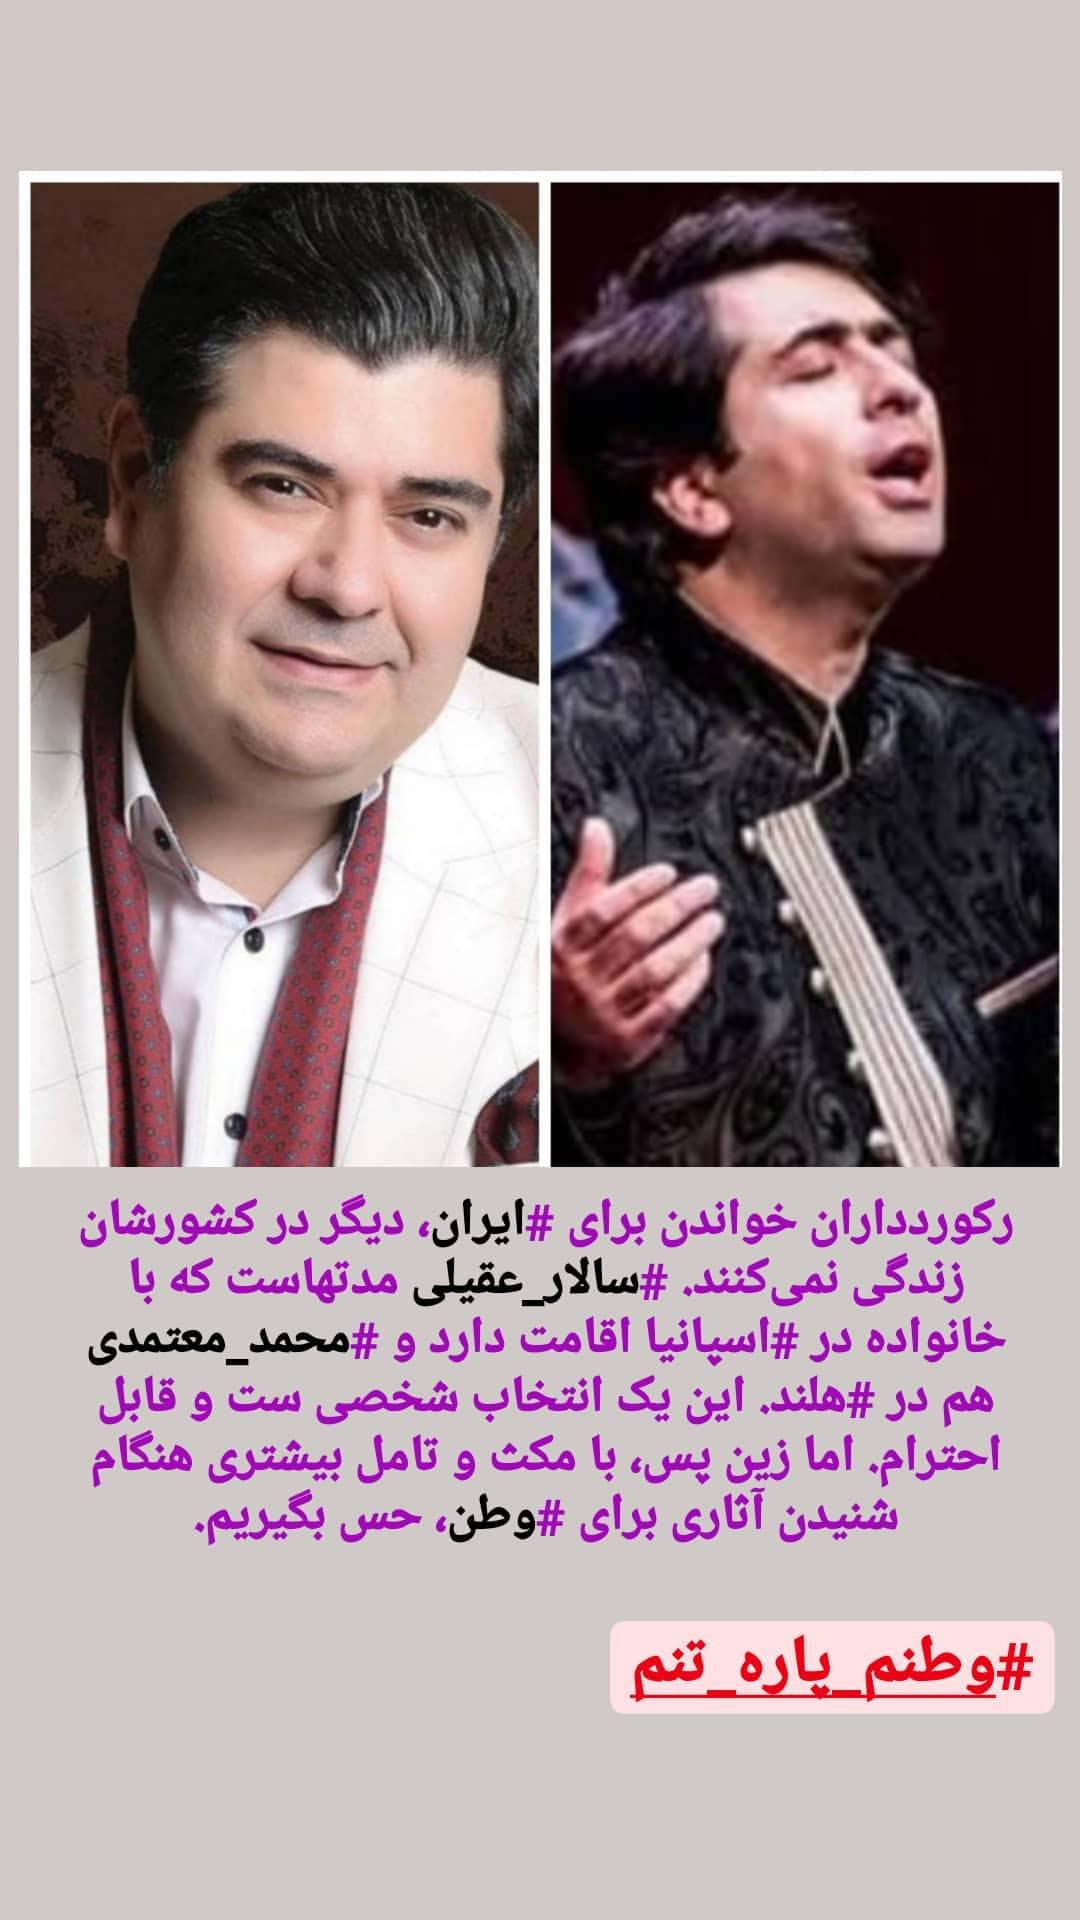 bahman_babazadeh_2614671730506792600_254123586